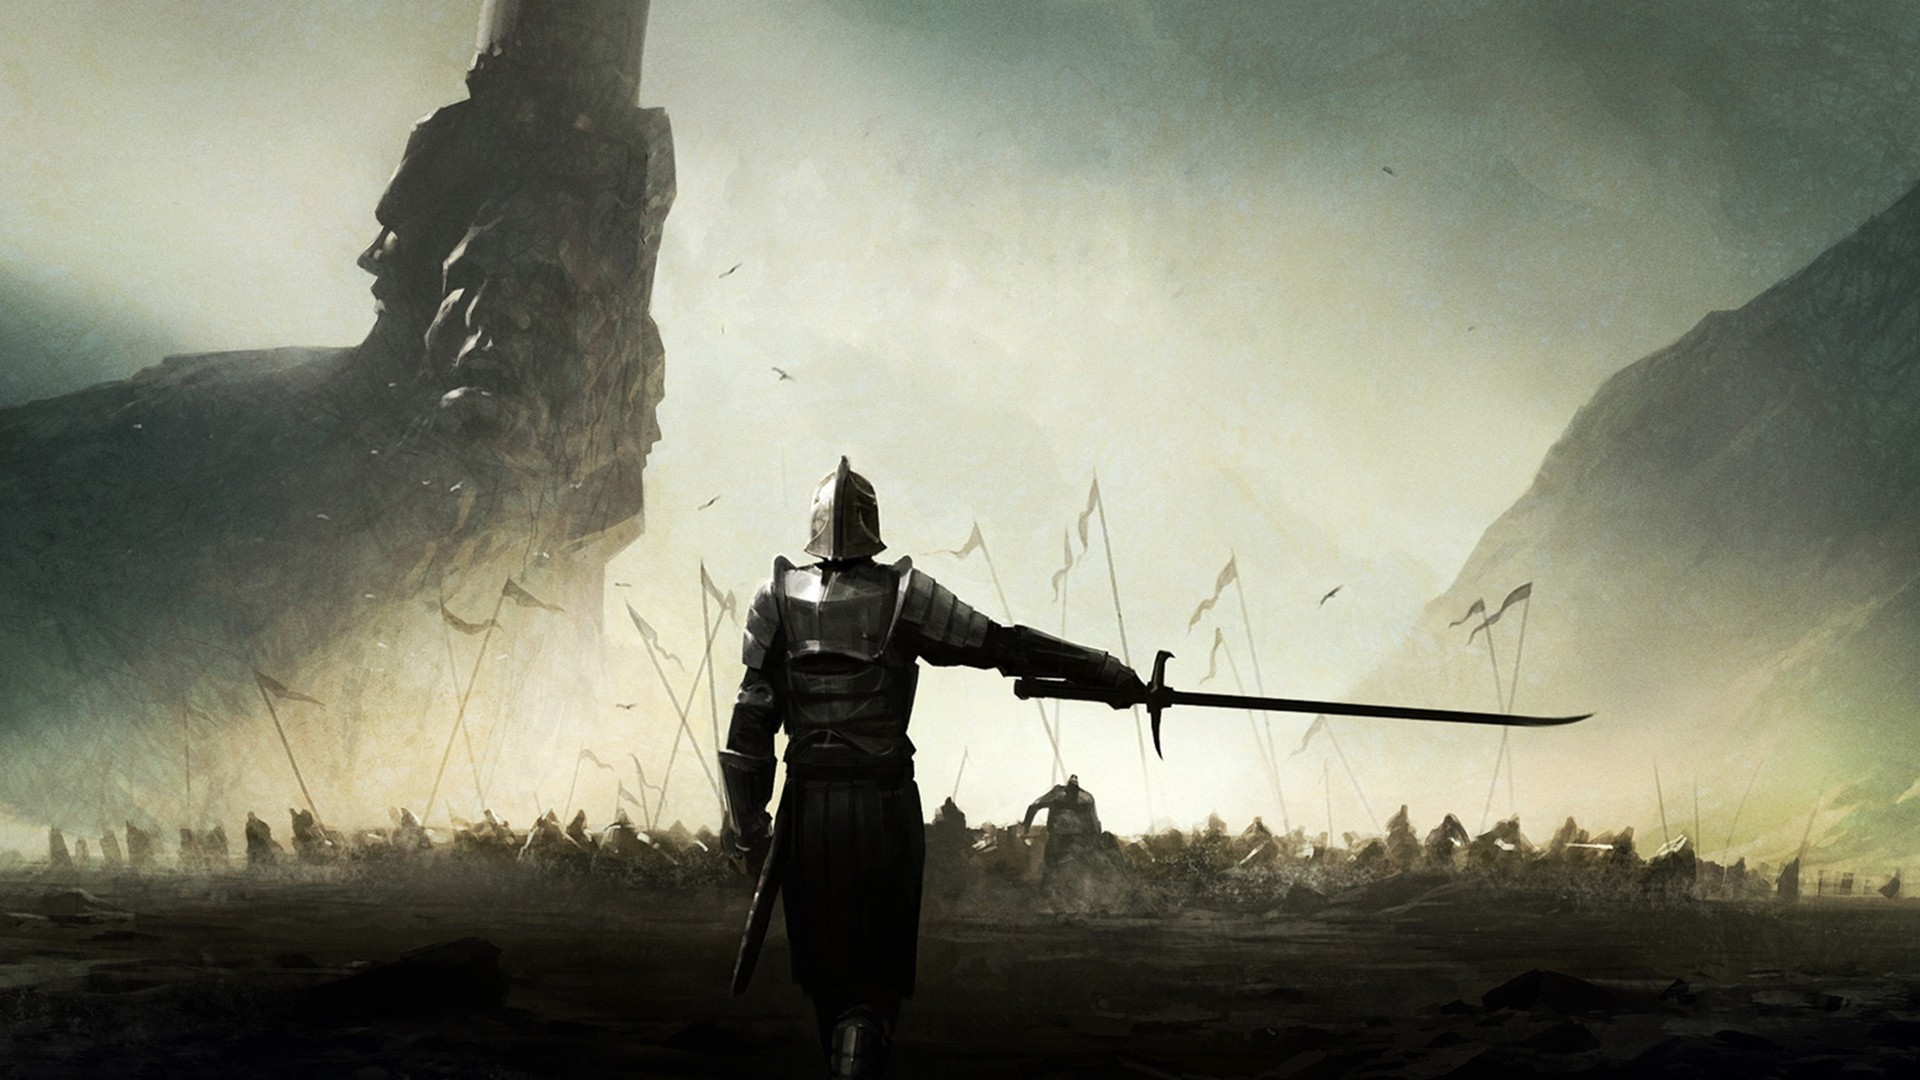 General 1920x1080 knight sword warrior video games fantasy art